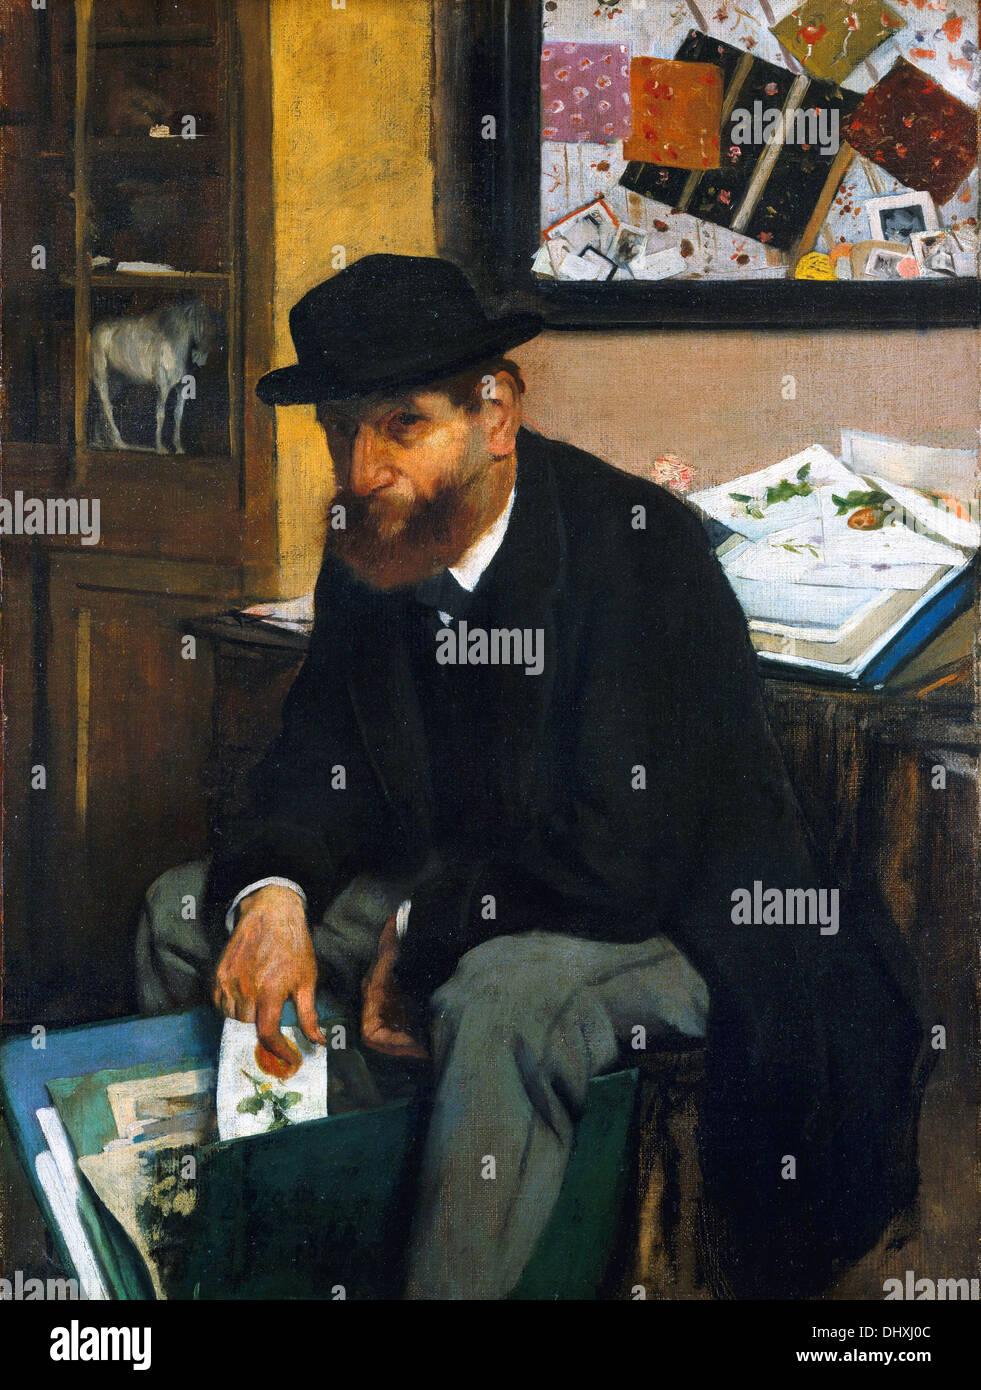 Der Kollektor des Prints - von Edgar Degas, 1866 Stockbild